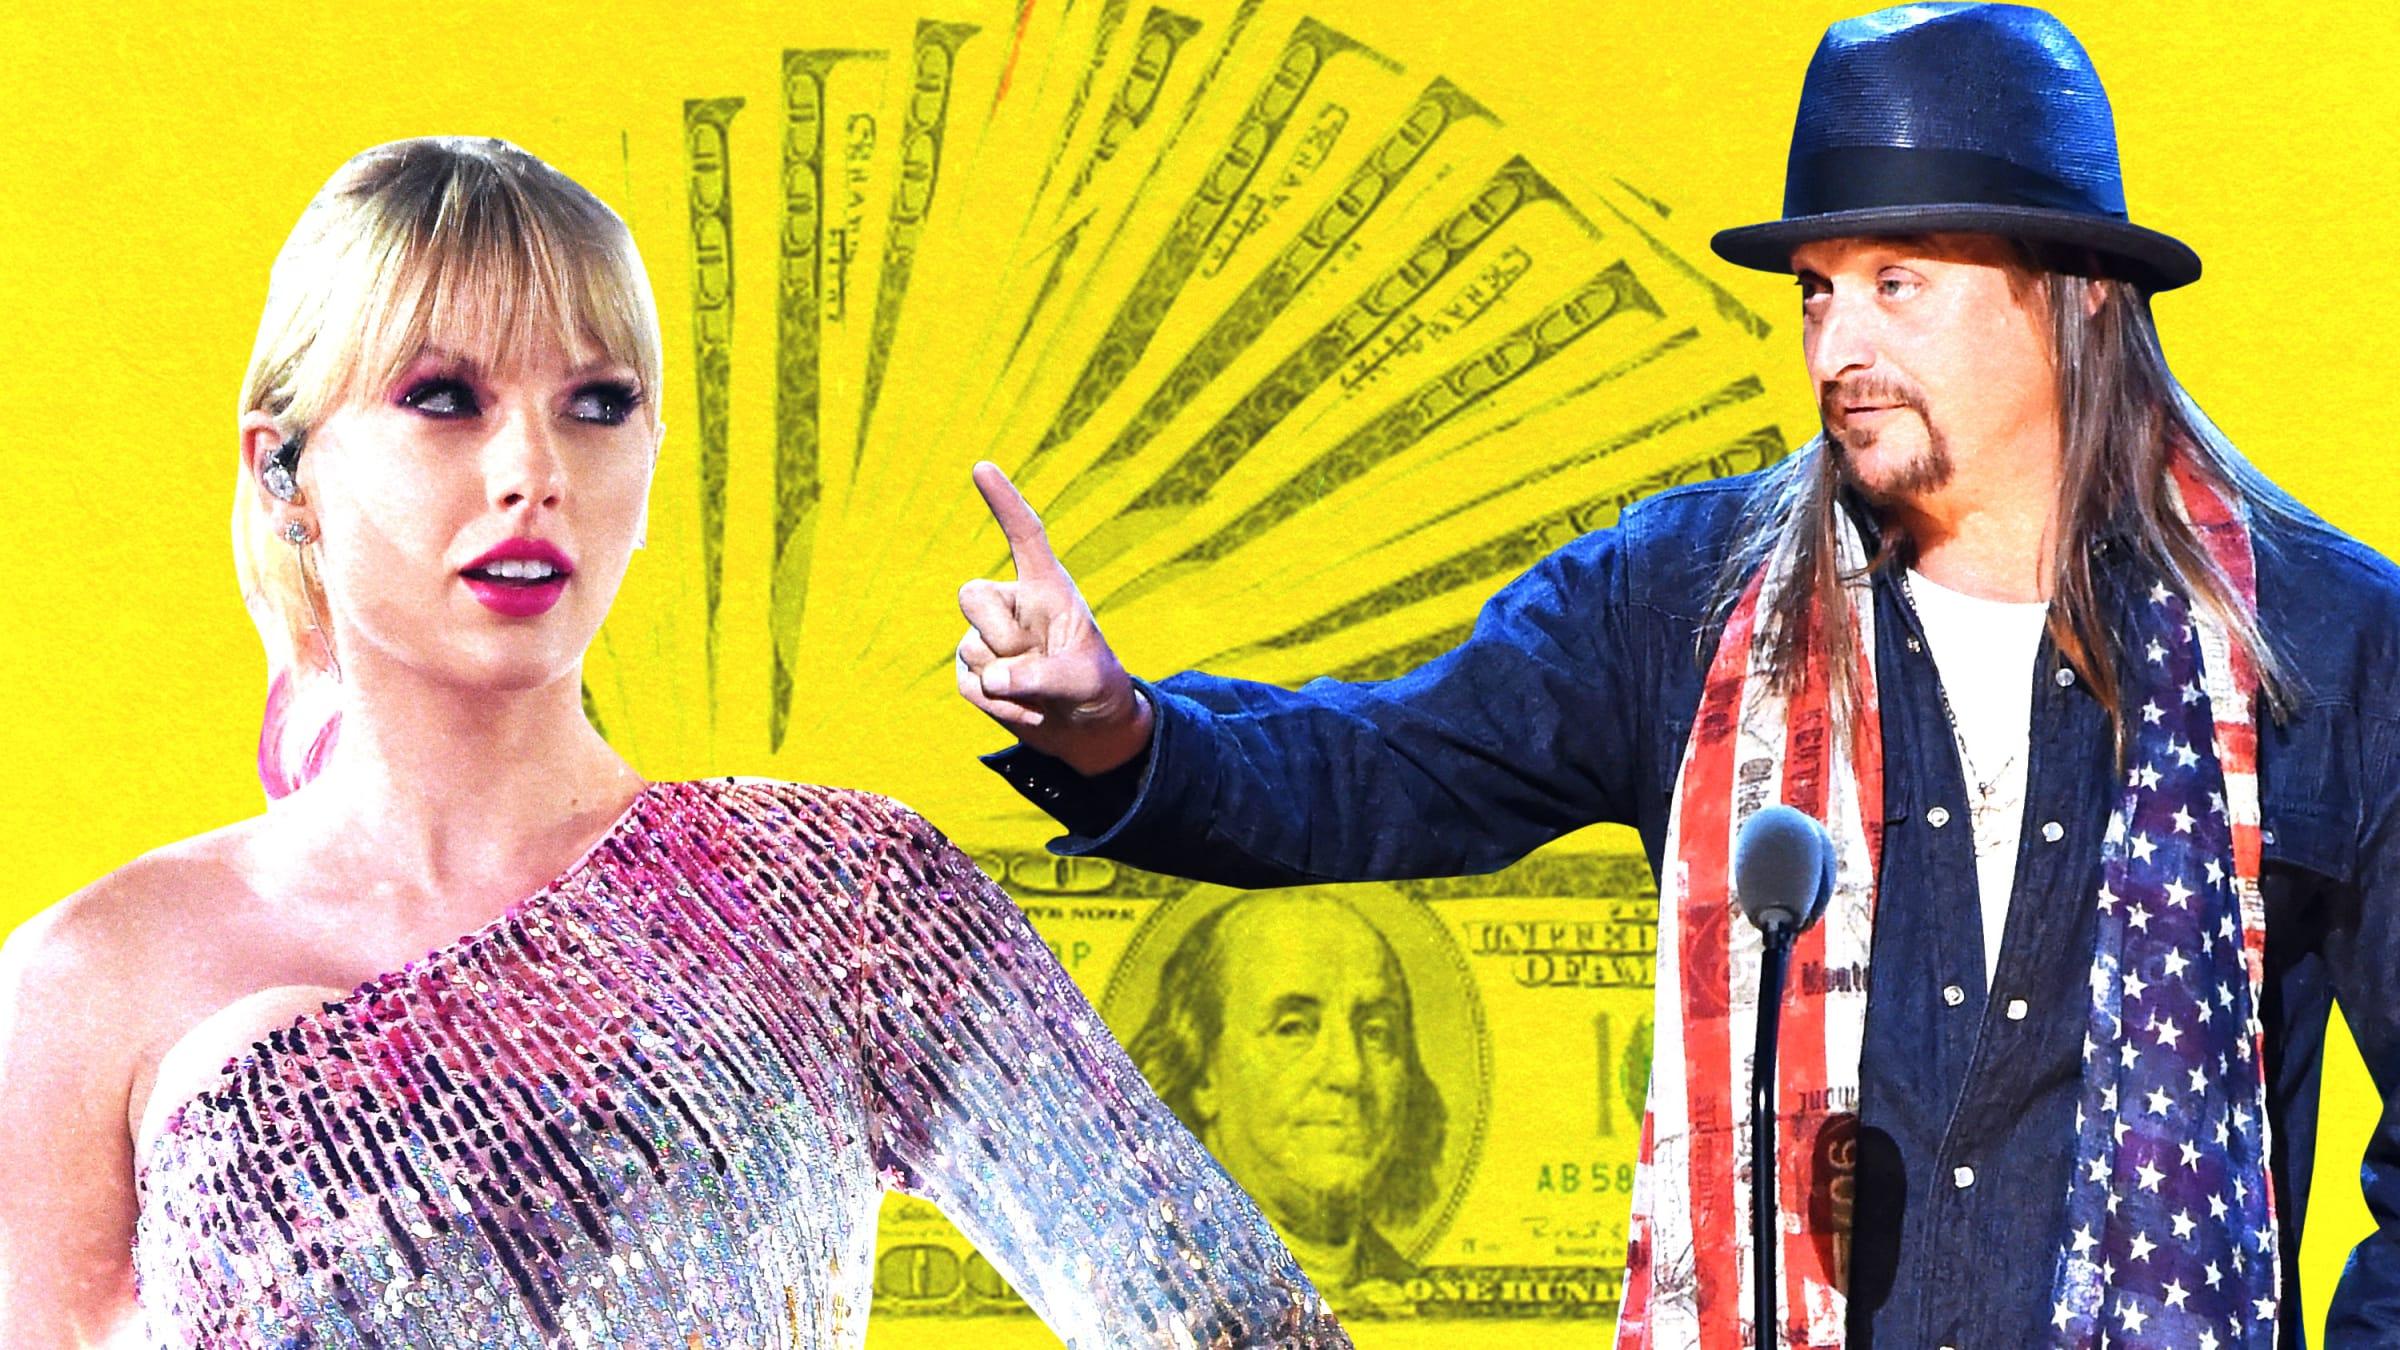 Kid Rock, Who Slut-Shamed Taylor Swift, Is a Rich-Kid Poseur Who Grew Up on a 1.3 Million Estate